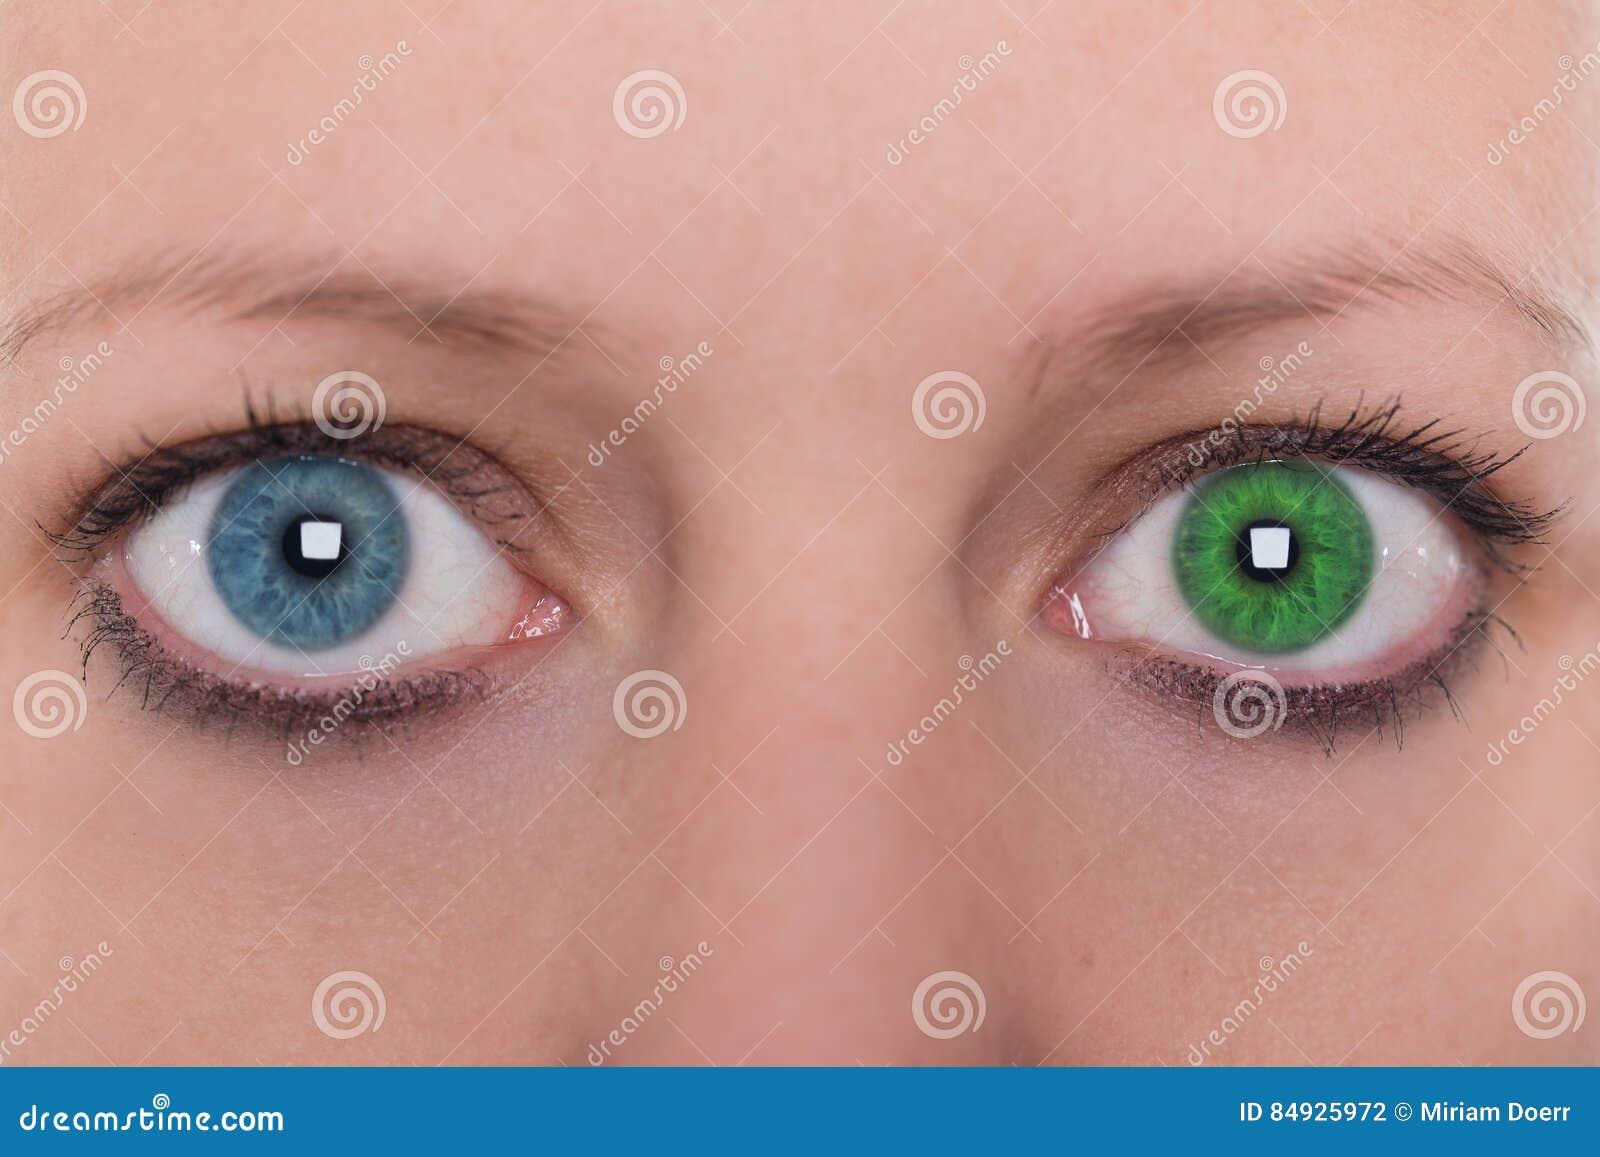 Young Woman With Heterochromia Iridum, Two Different Eye ...